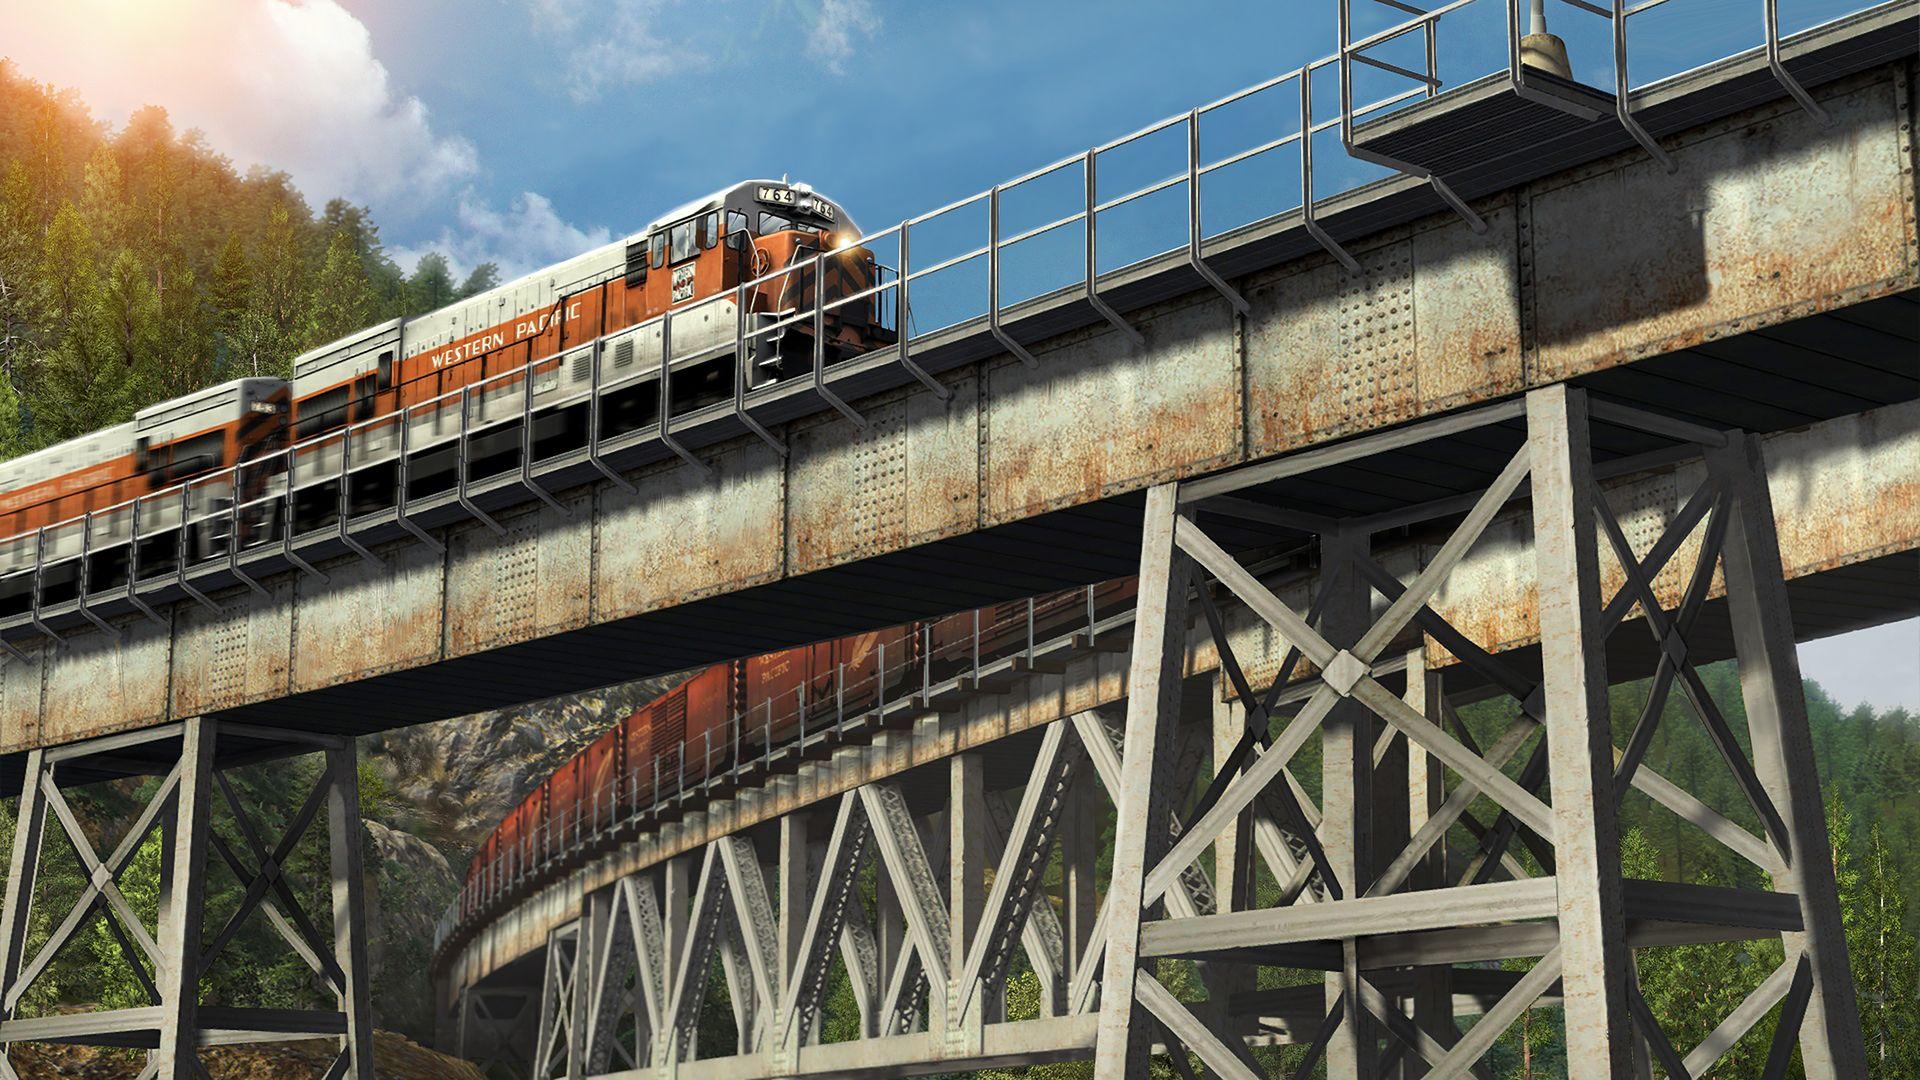 Train Simulator Feather River Canyon